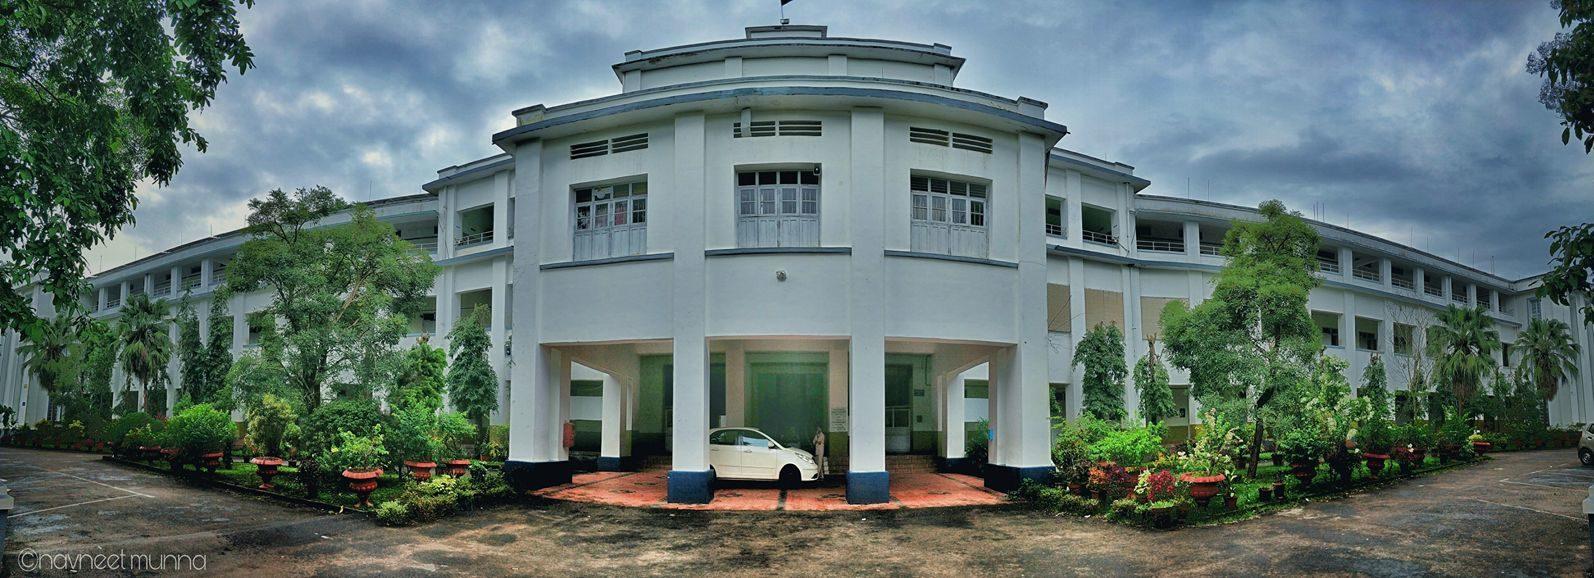 Christ College, Thiruvananthapuram